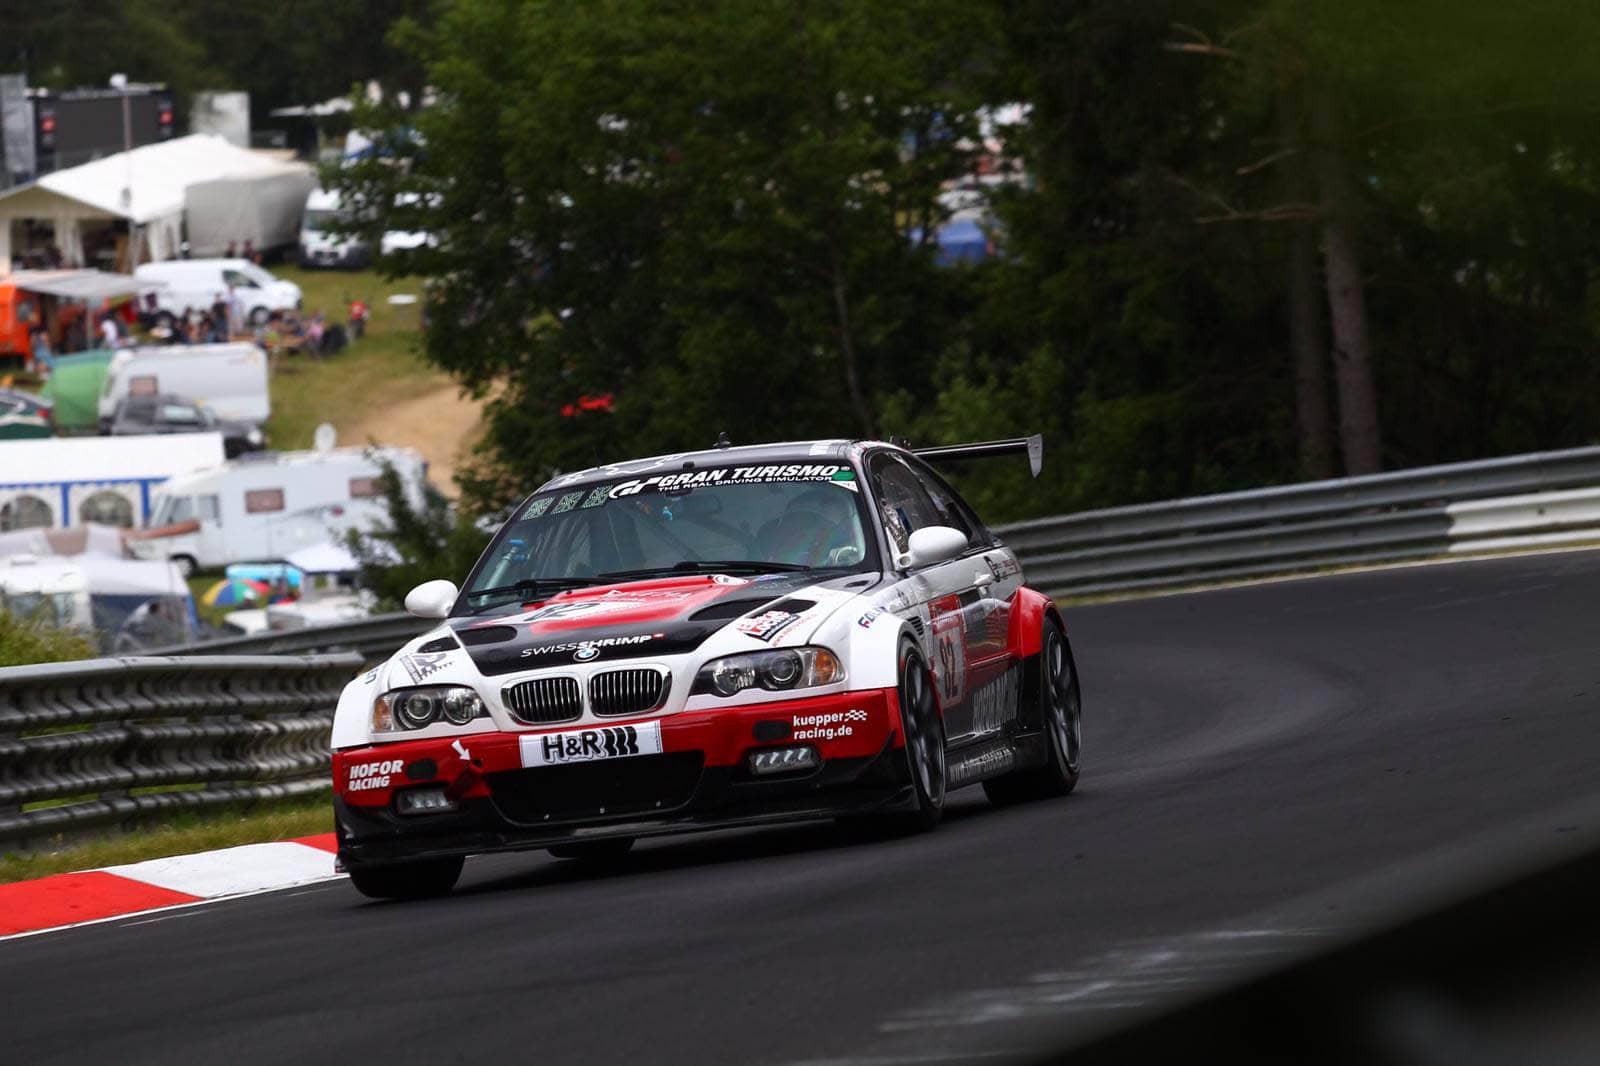 IMG 1961 - 21.-23. Juni 2019 – ADAC TOTAL 24h Rennen – Nürburgring / DE